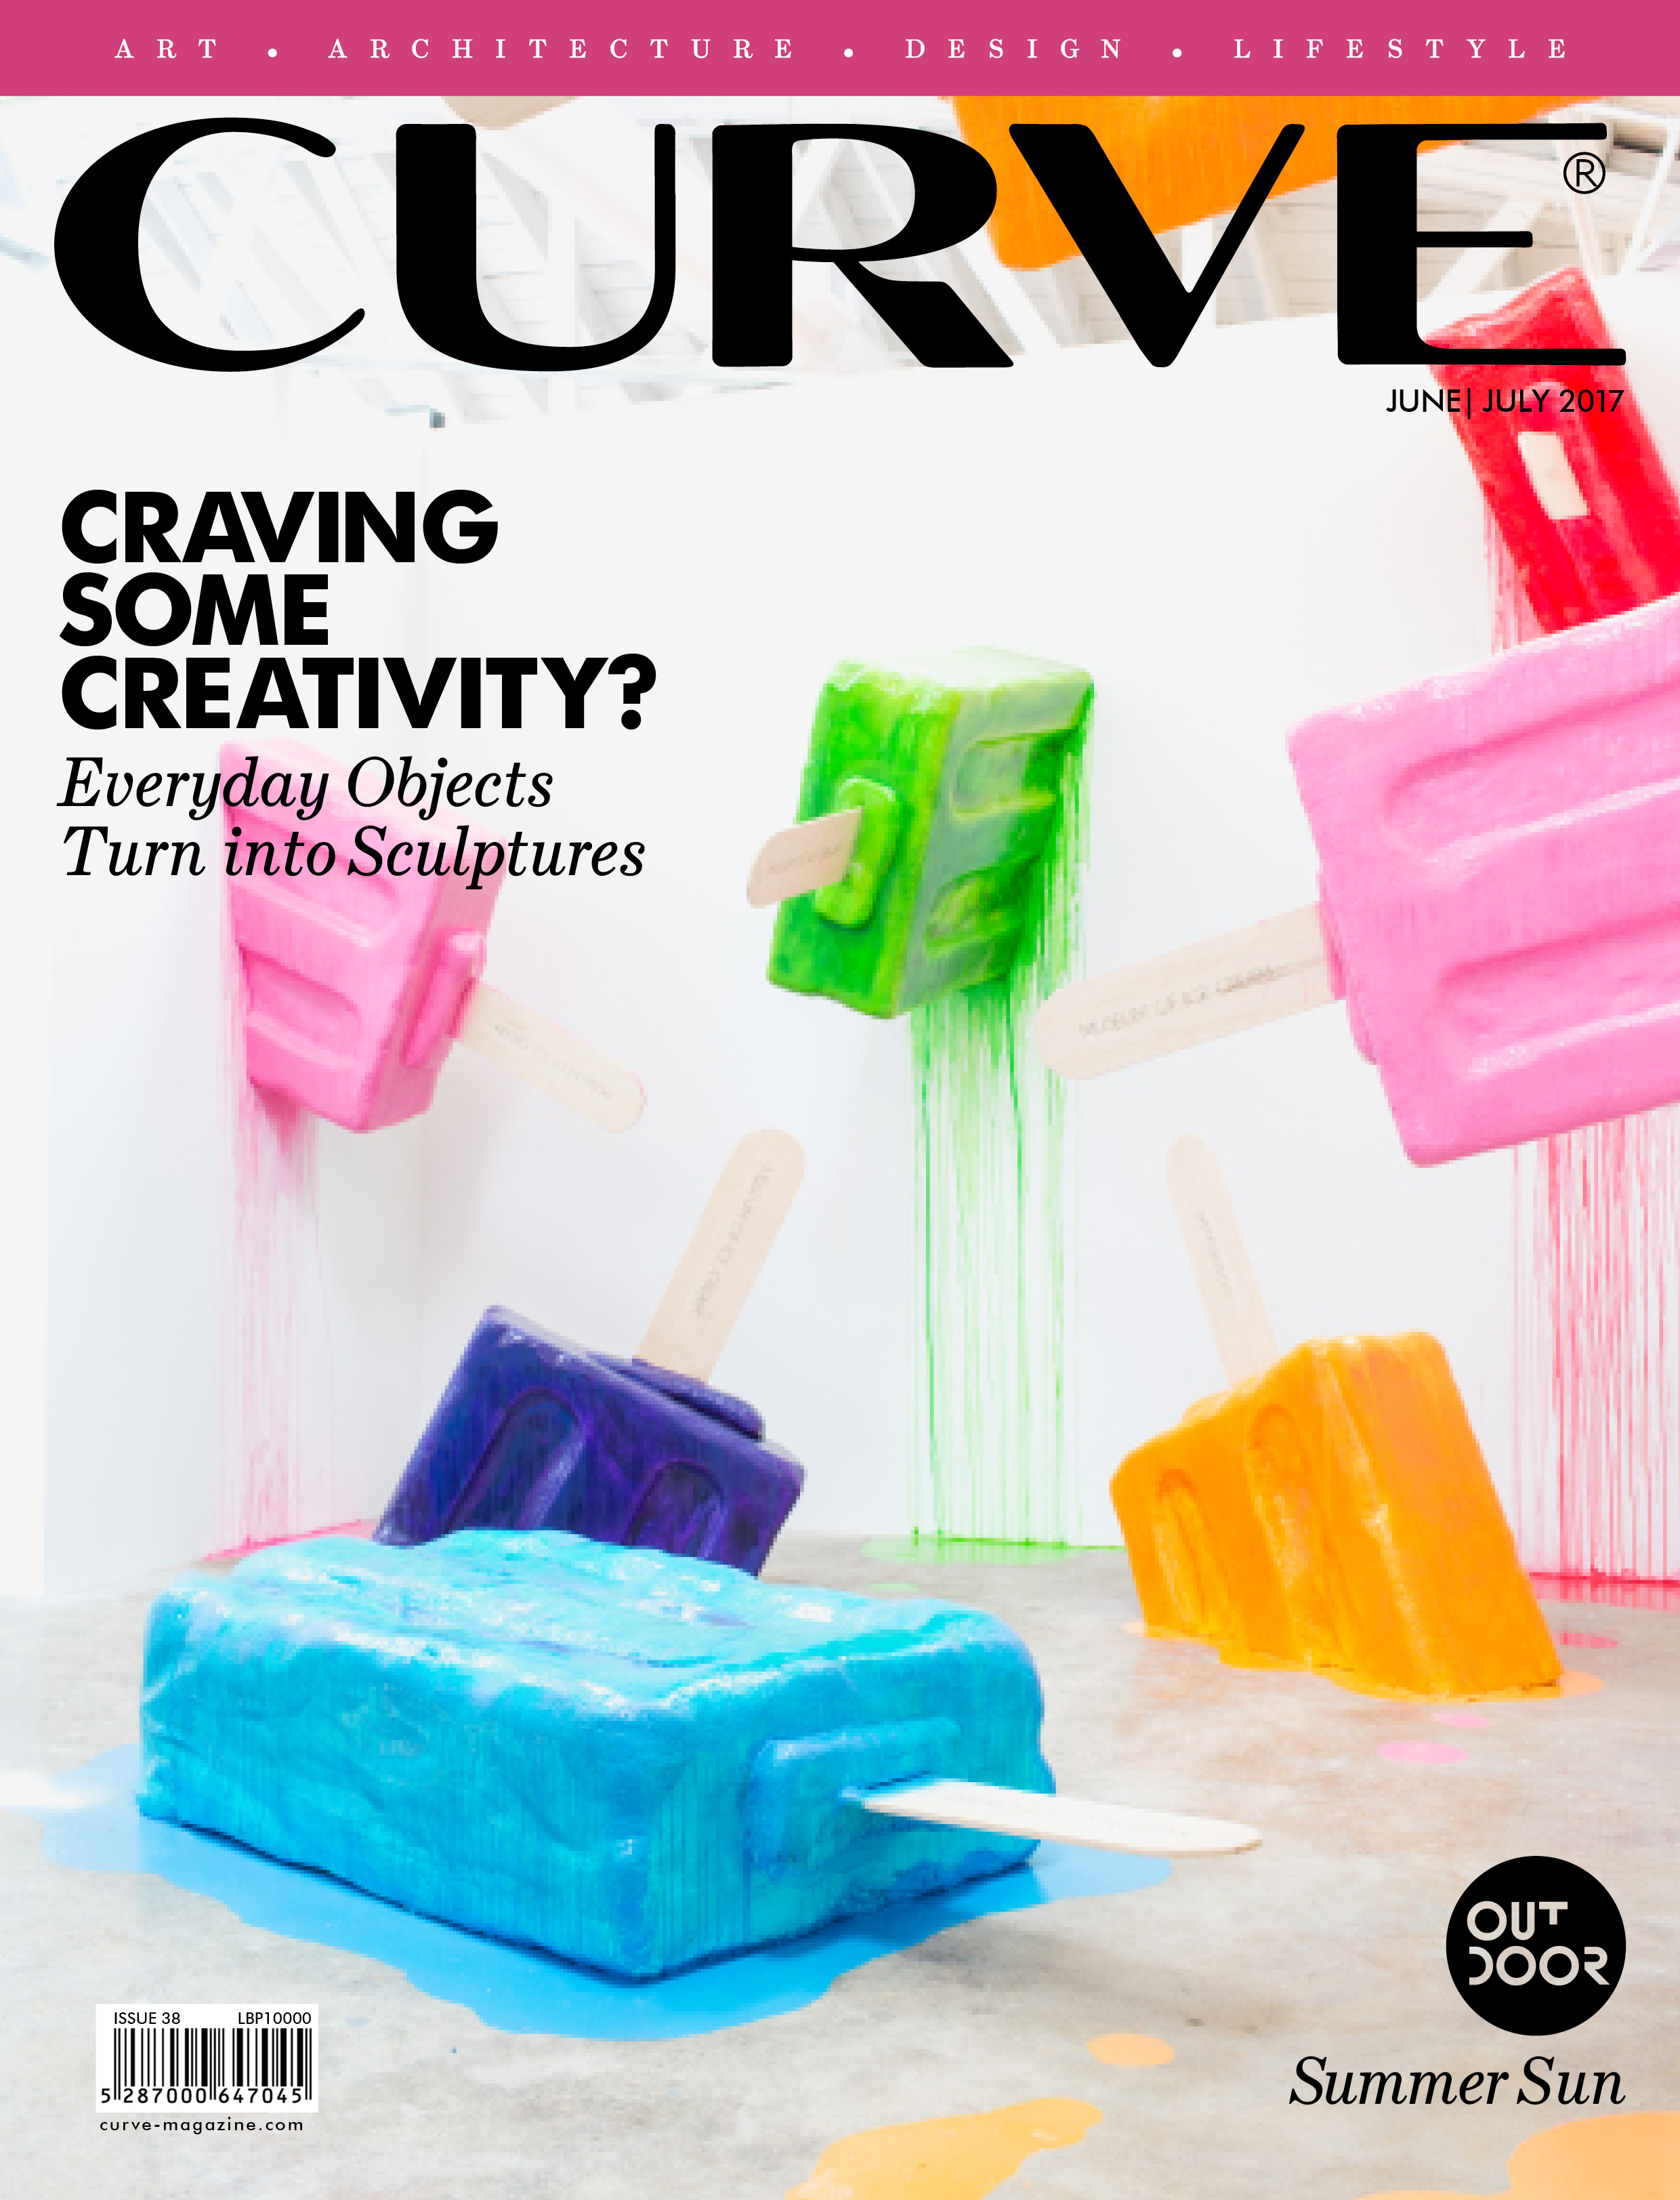 COVER 38 AW.jpg